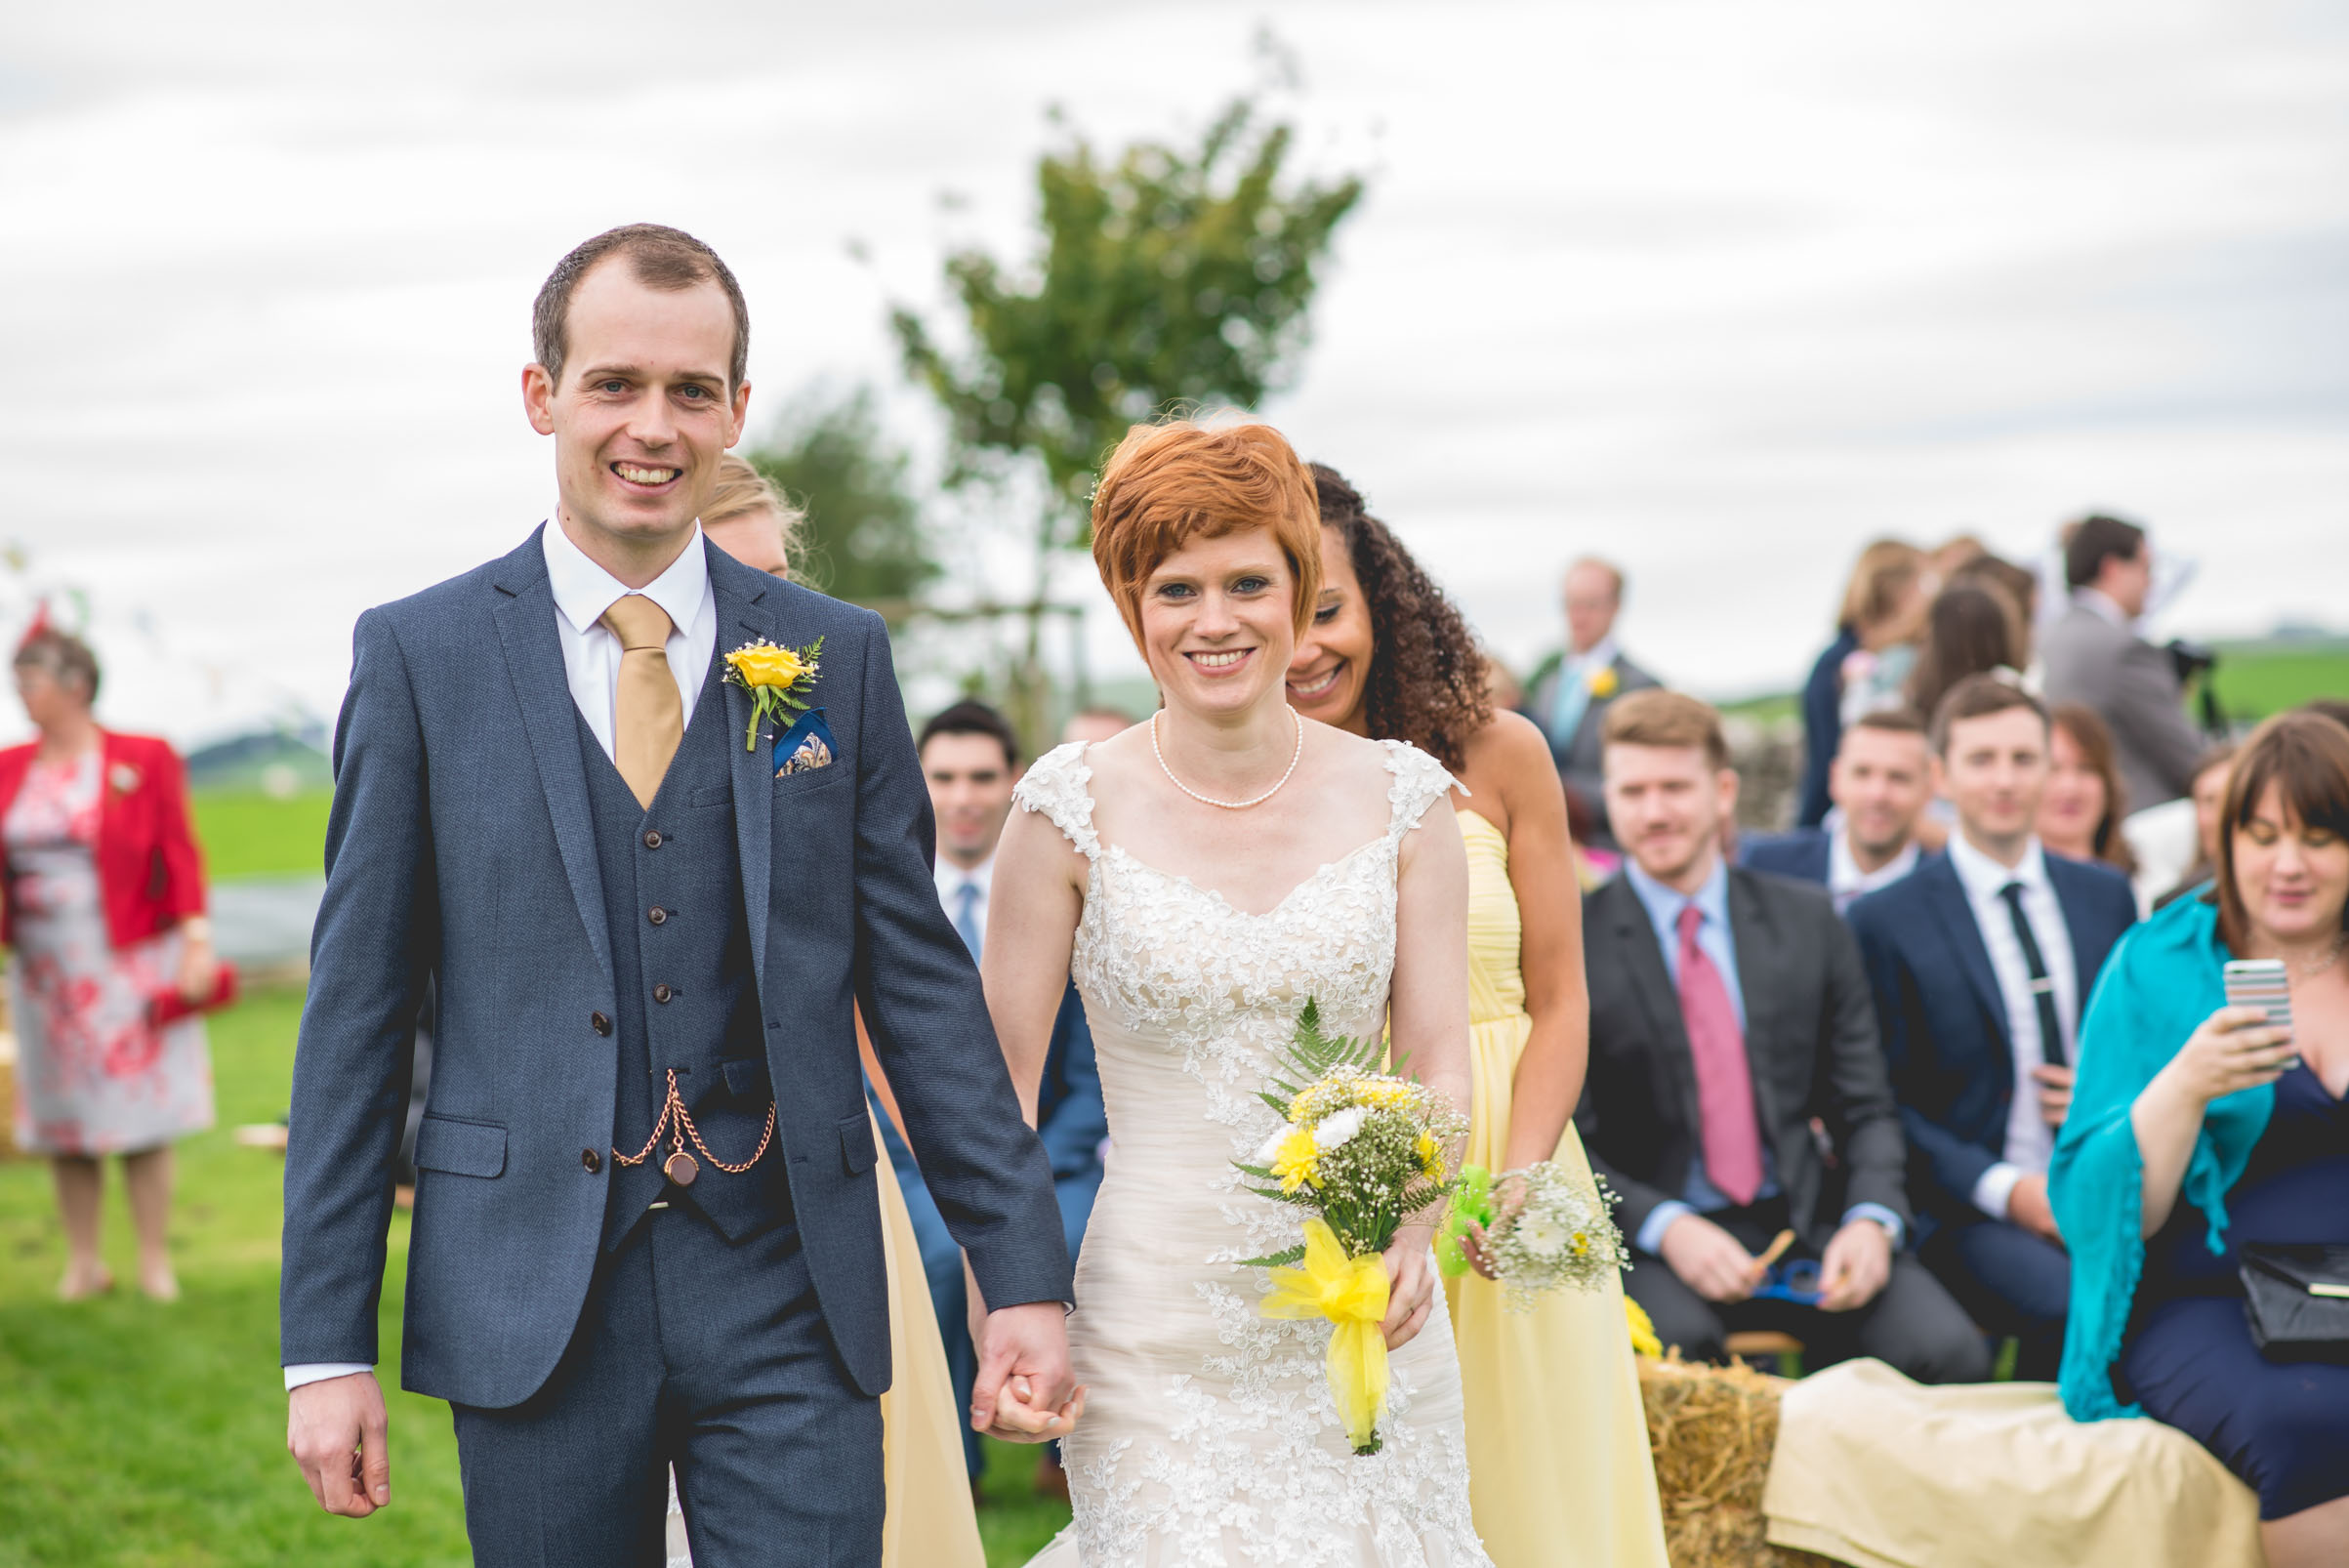 Peak+district+farm+wedding+lower+damgate+photographer-140.jpg